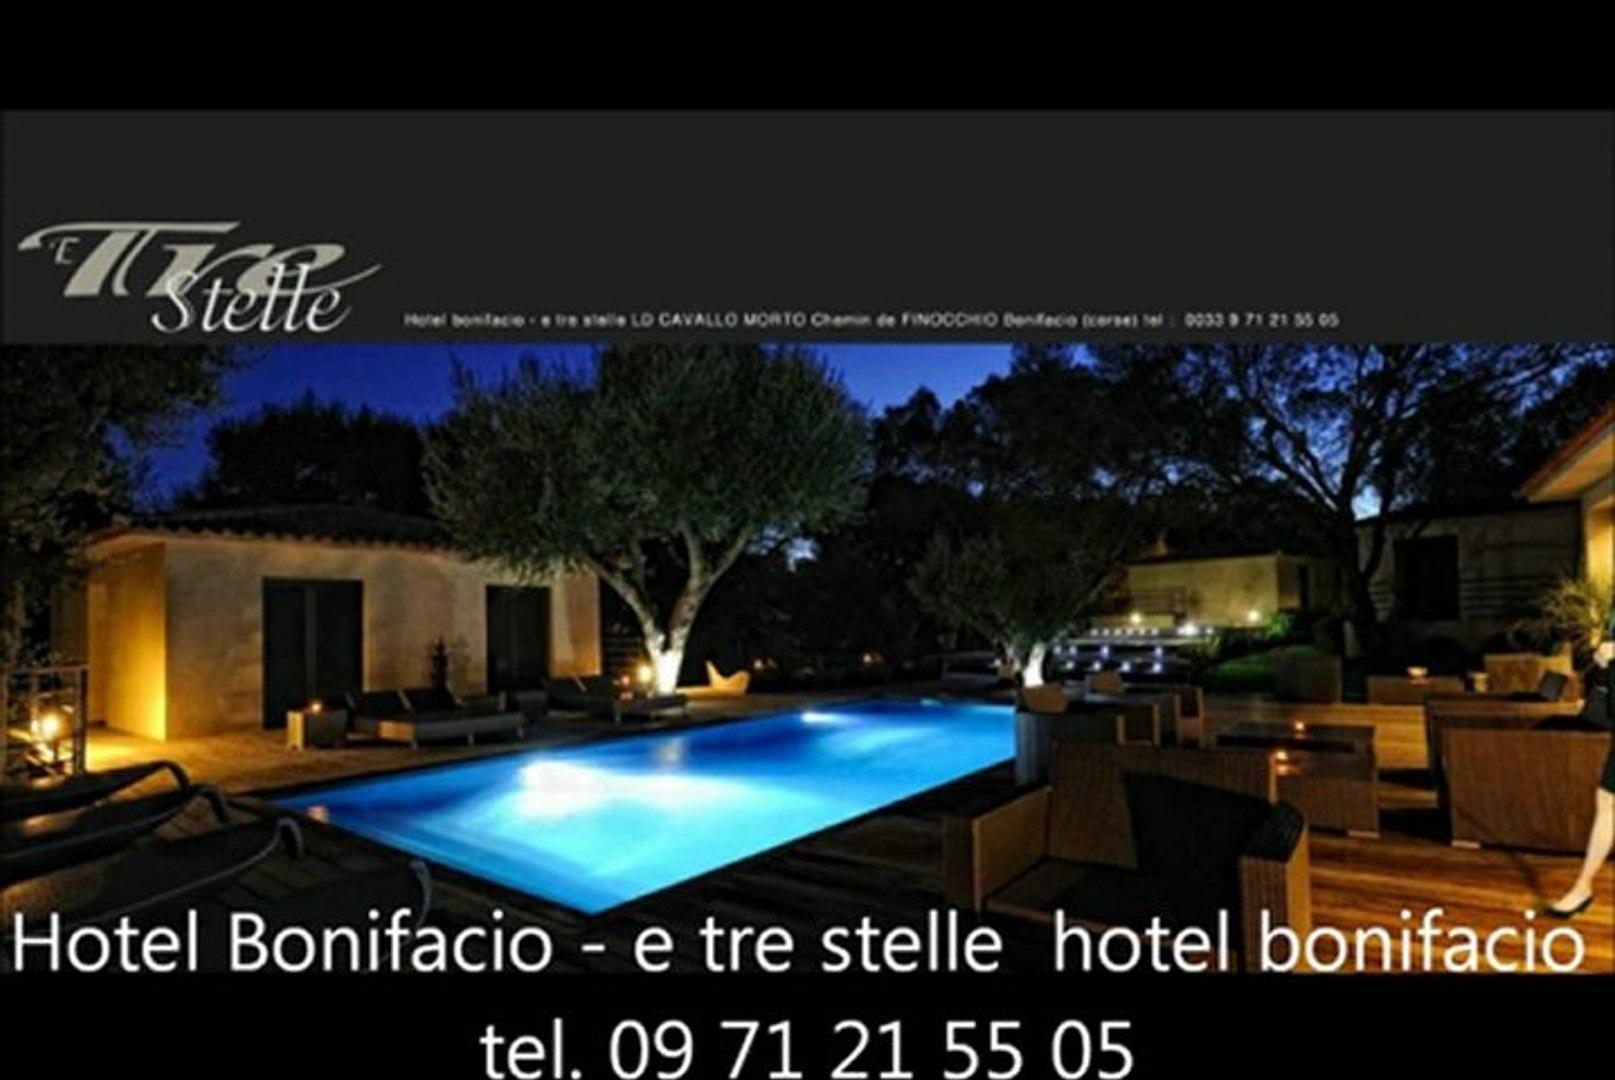 hotel bonifacio - tel. 09 71 21 55 05 / hotel bonifacio -